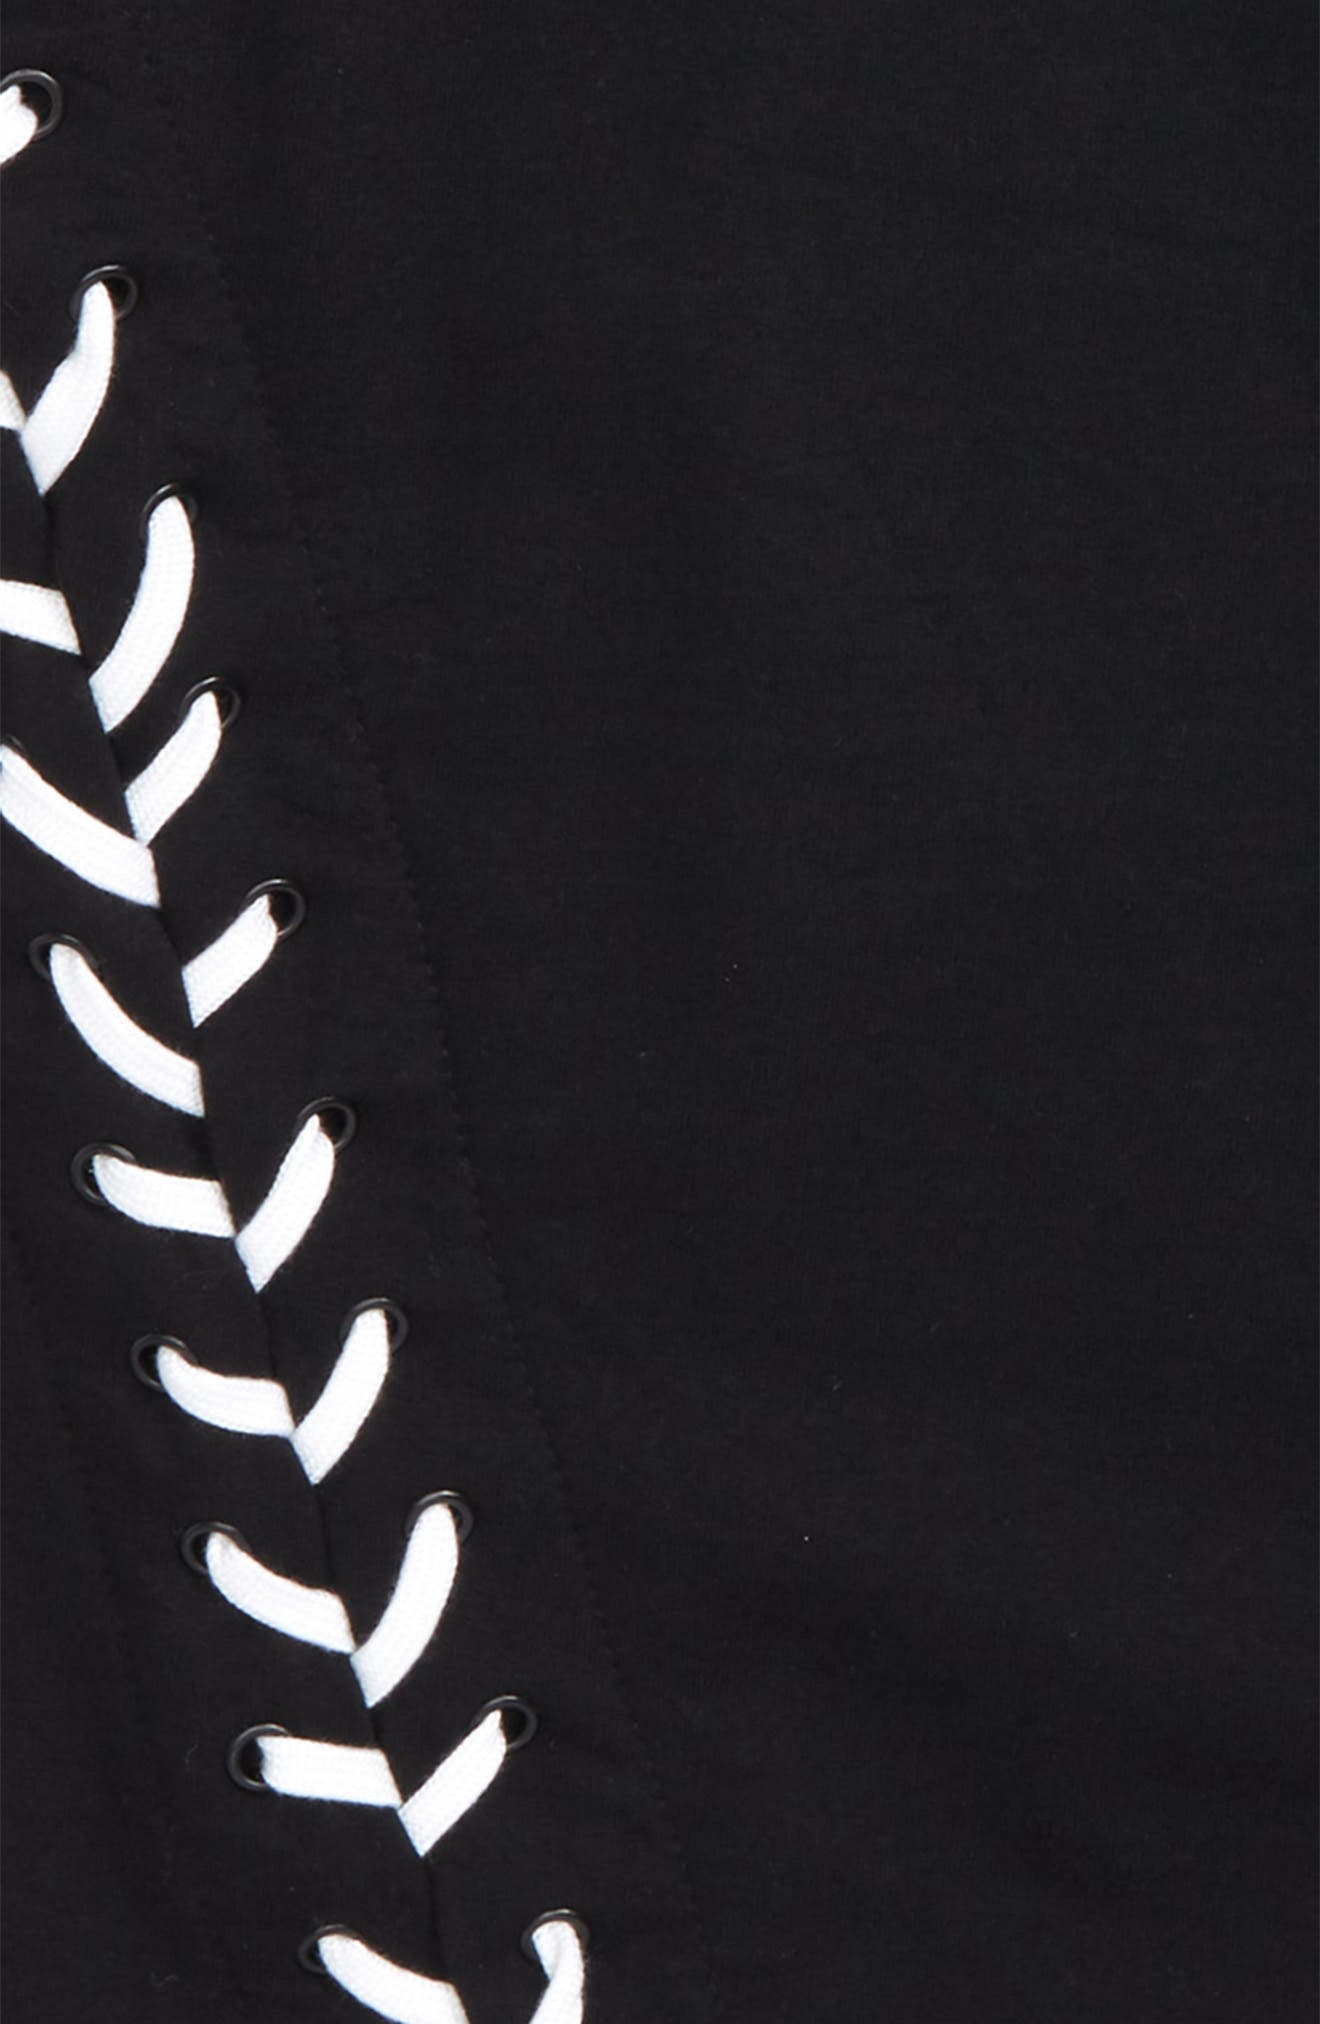 Adorn Sweatshirt Dress,                             Alternate thumbnail 3, color,                             Black